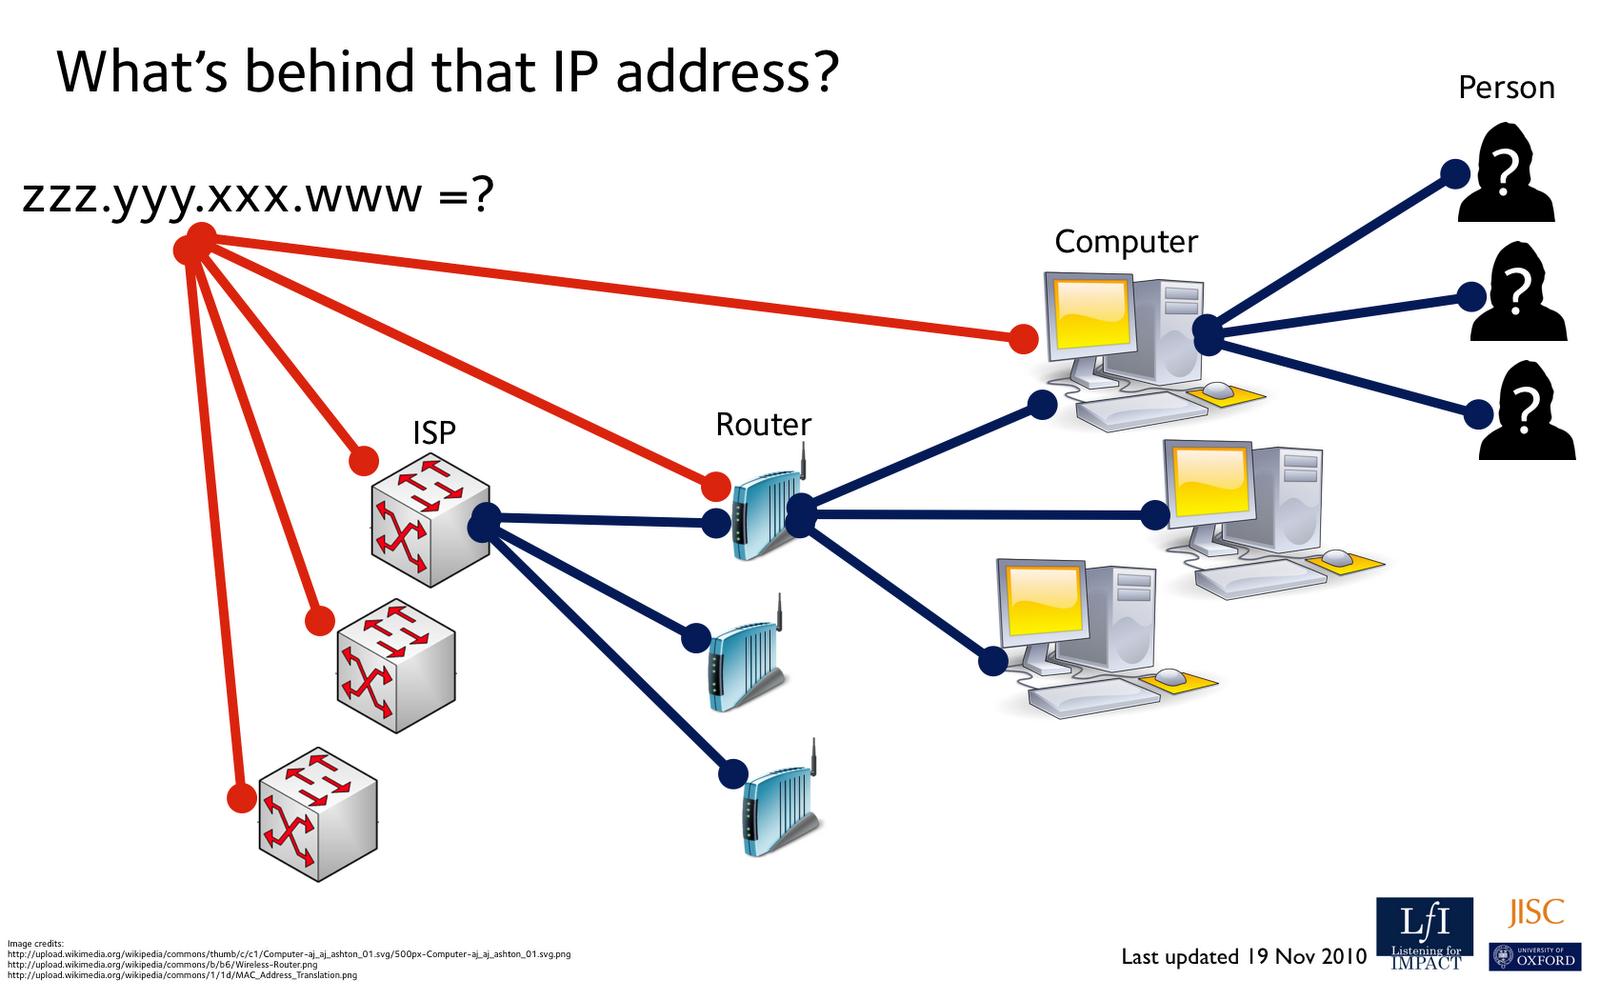 ip addresses: